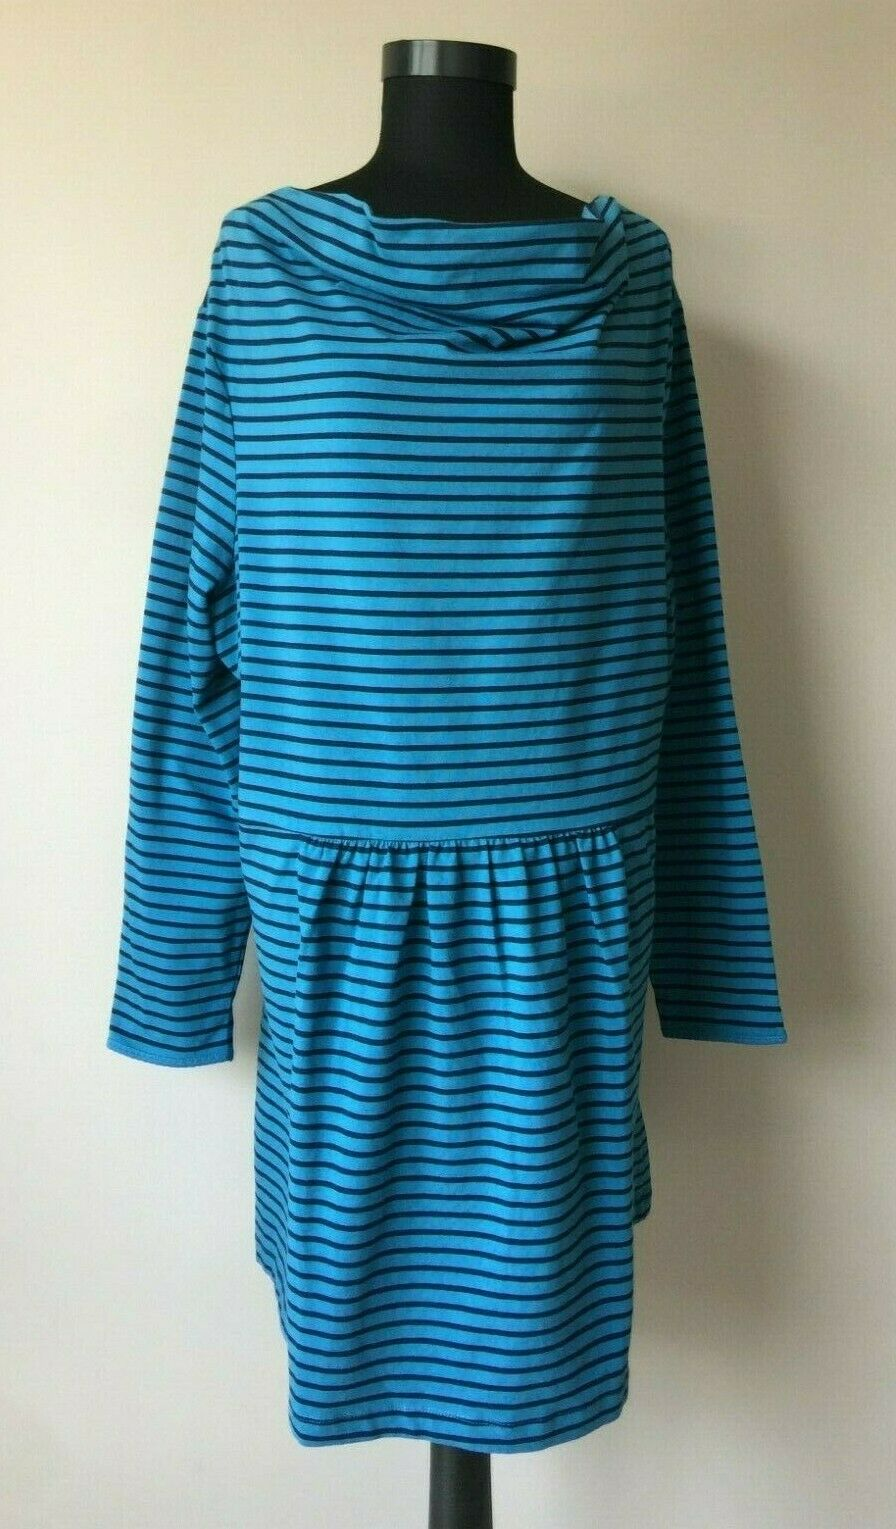 Deerberg Damen kleid Lang Bluse Tunika gr.2XL